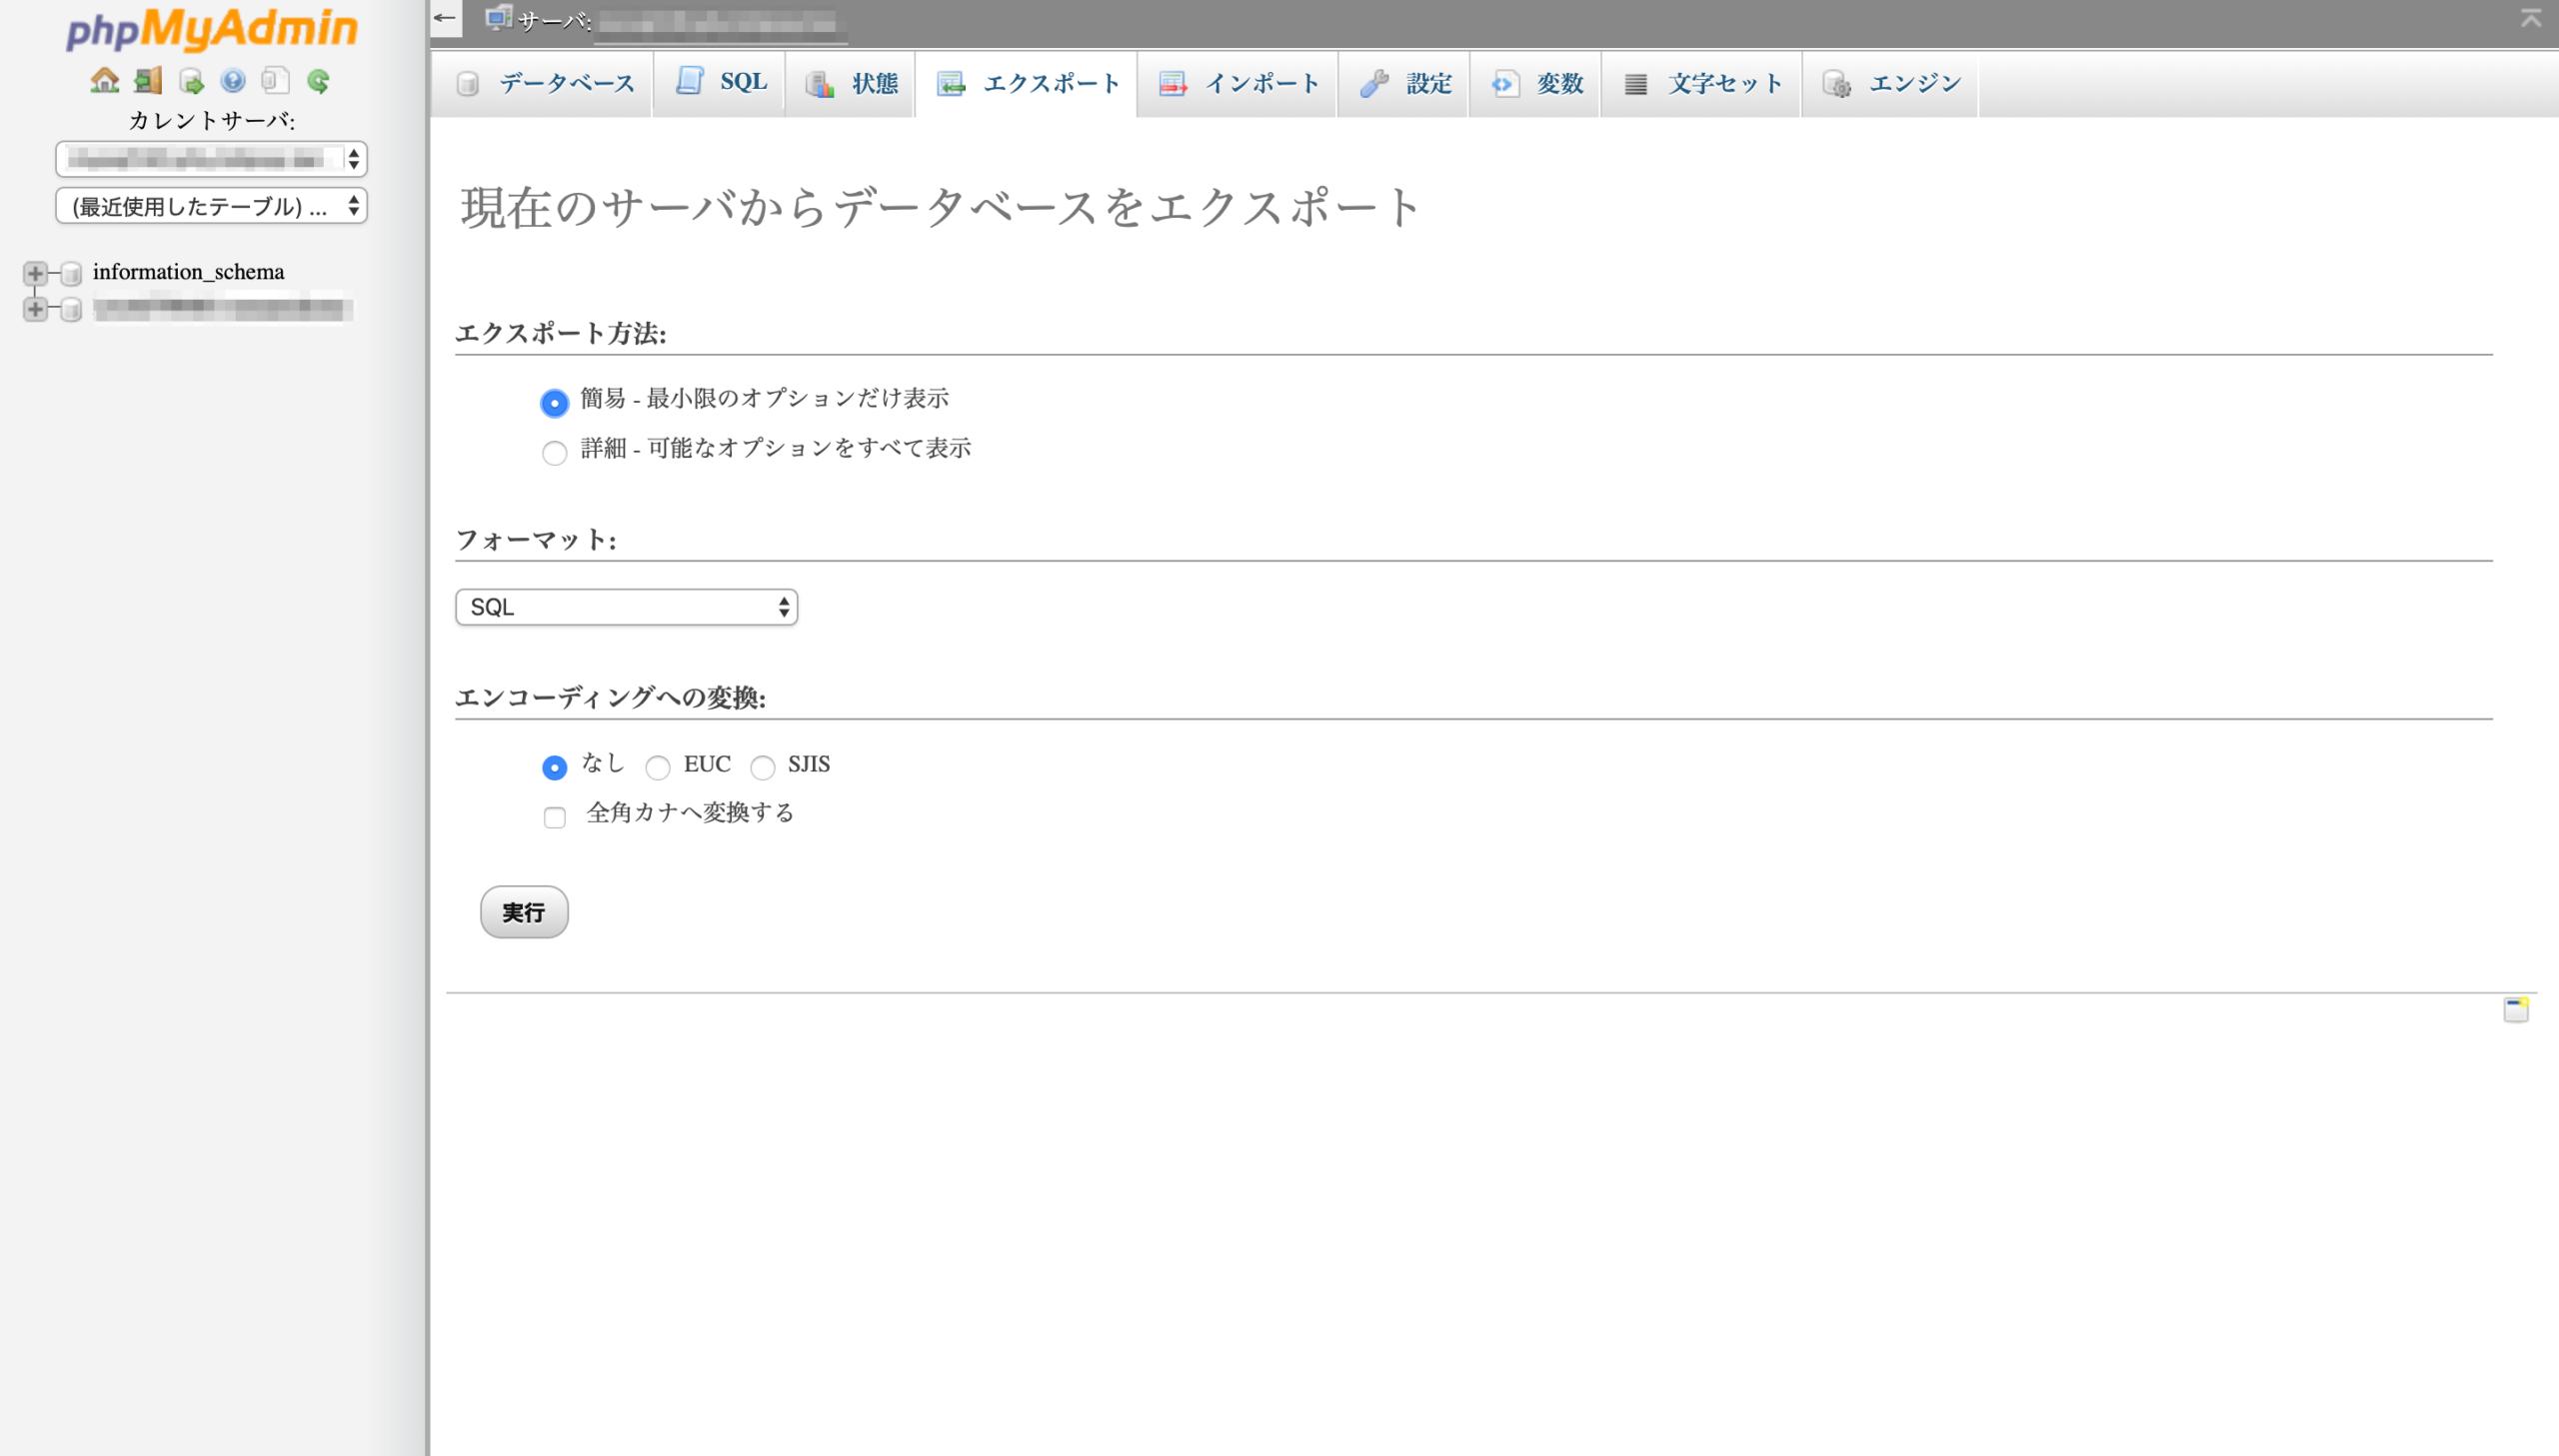 phpMyAdmin エクスポート画面